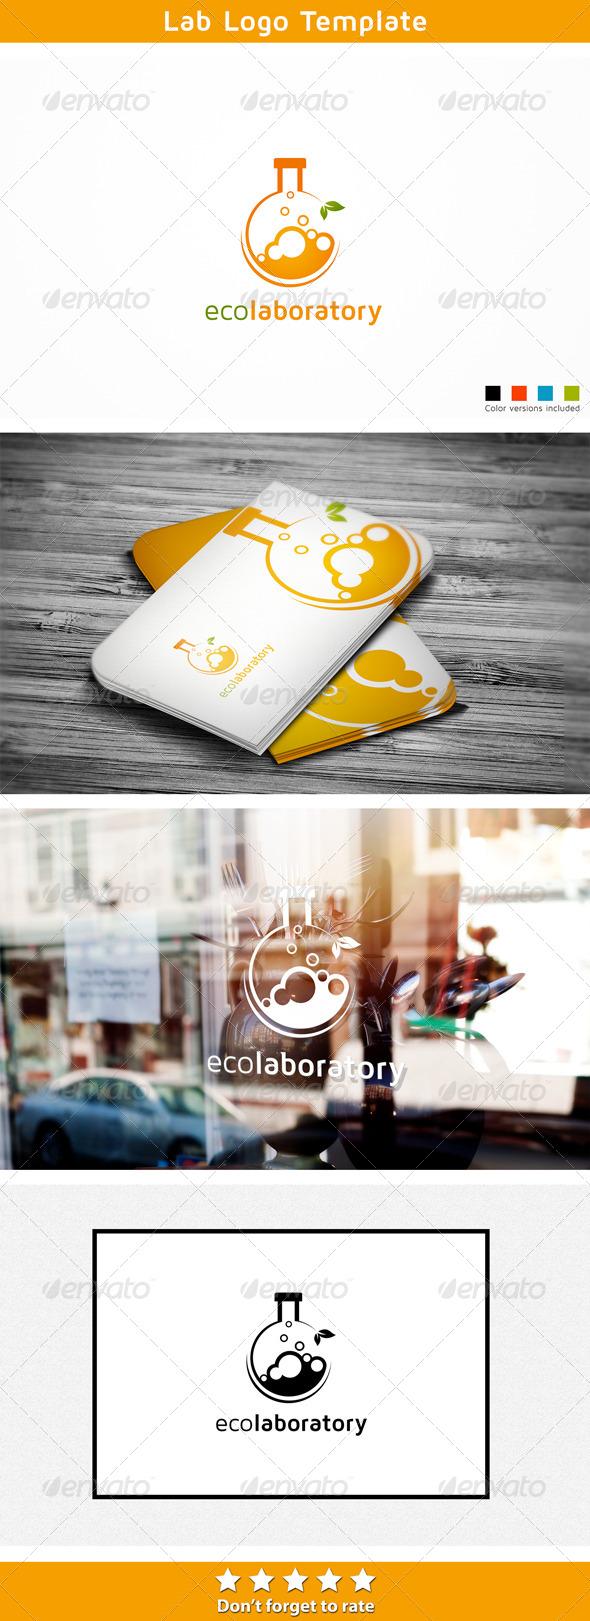 GraphicRiver Lab Logo Template 6007833